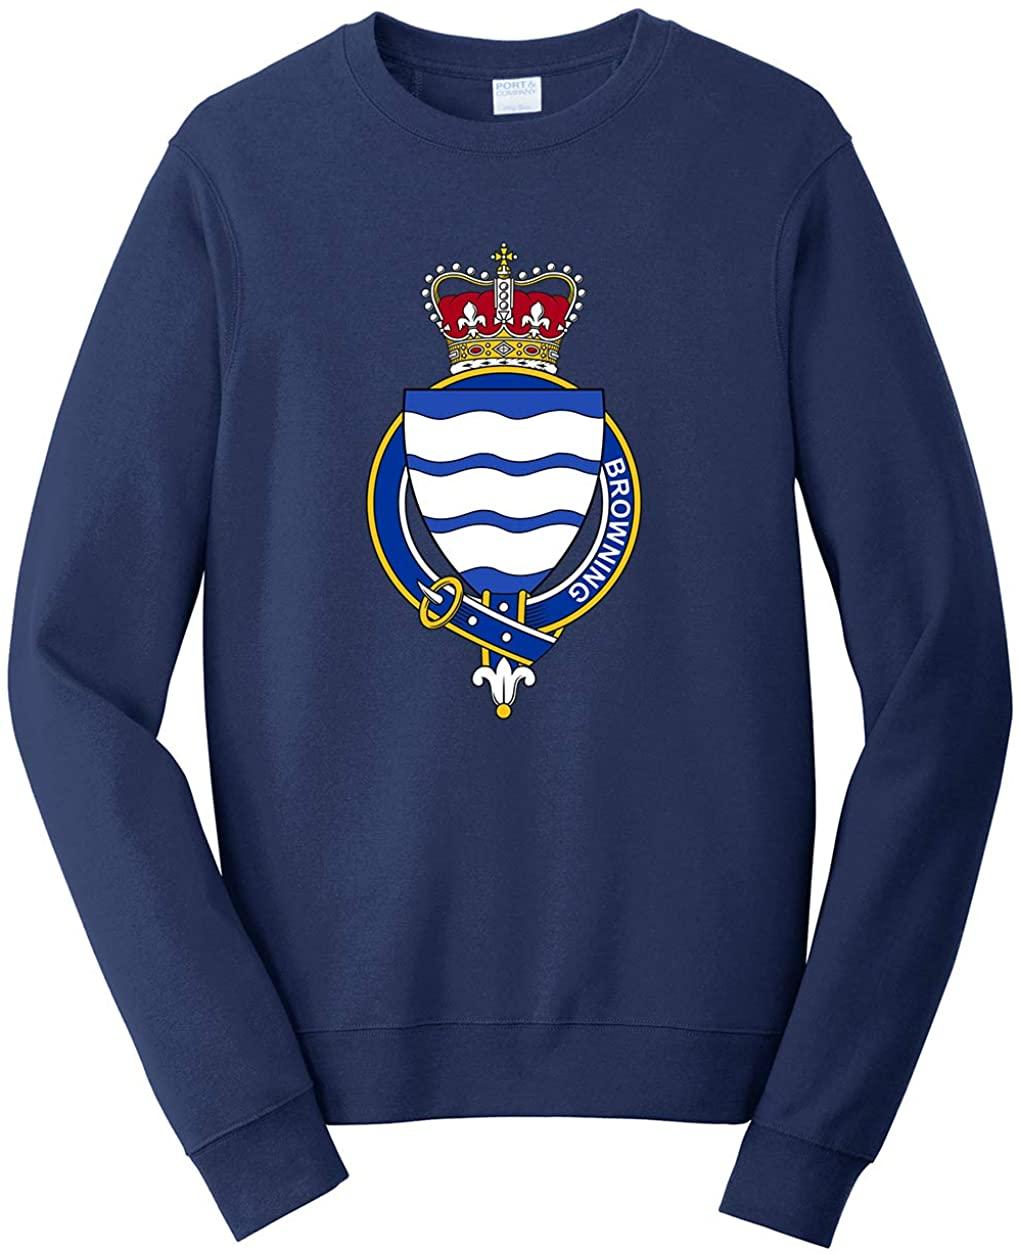 Tenacitee Unisex English Garter Family Browning Sweatshirt